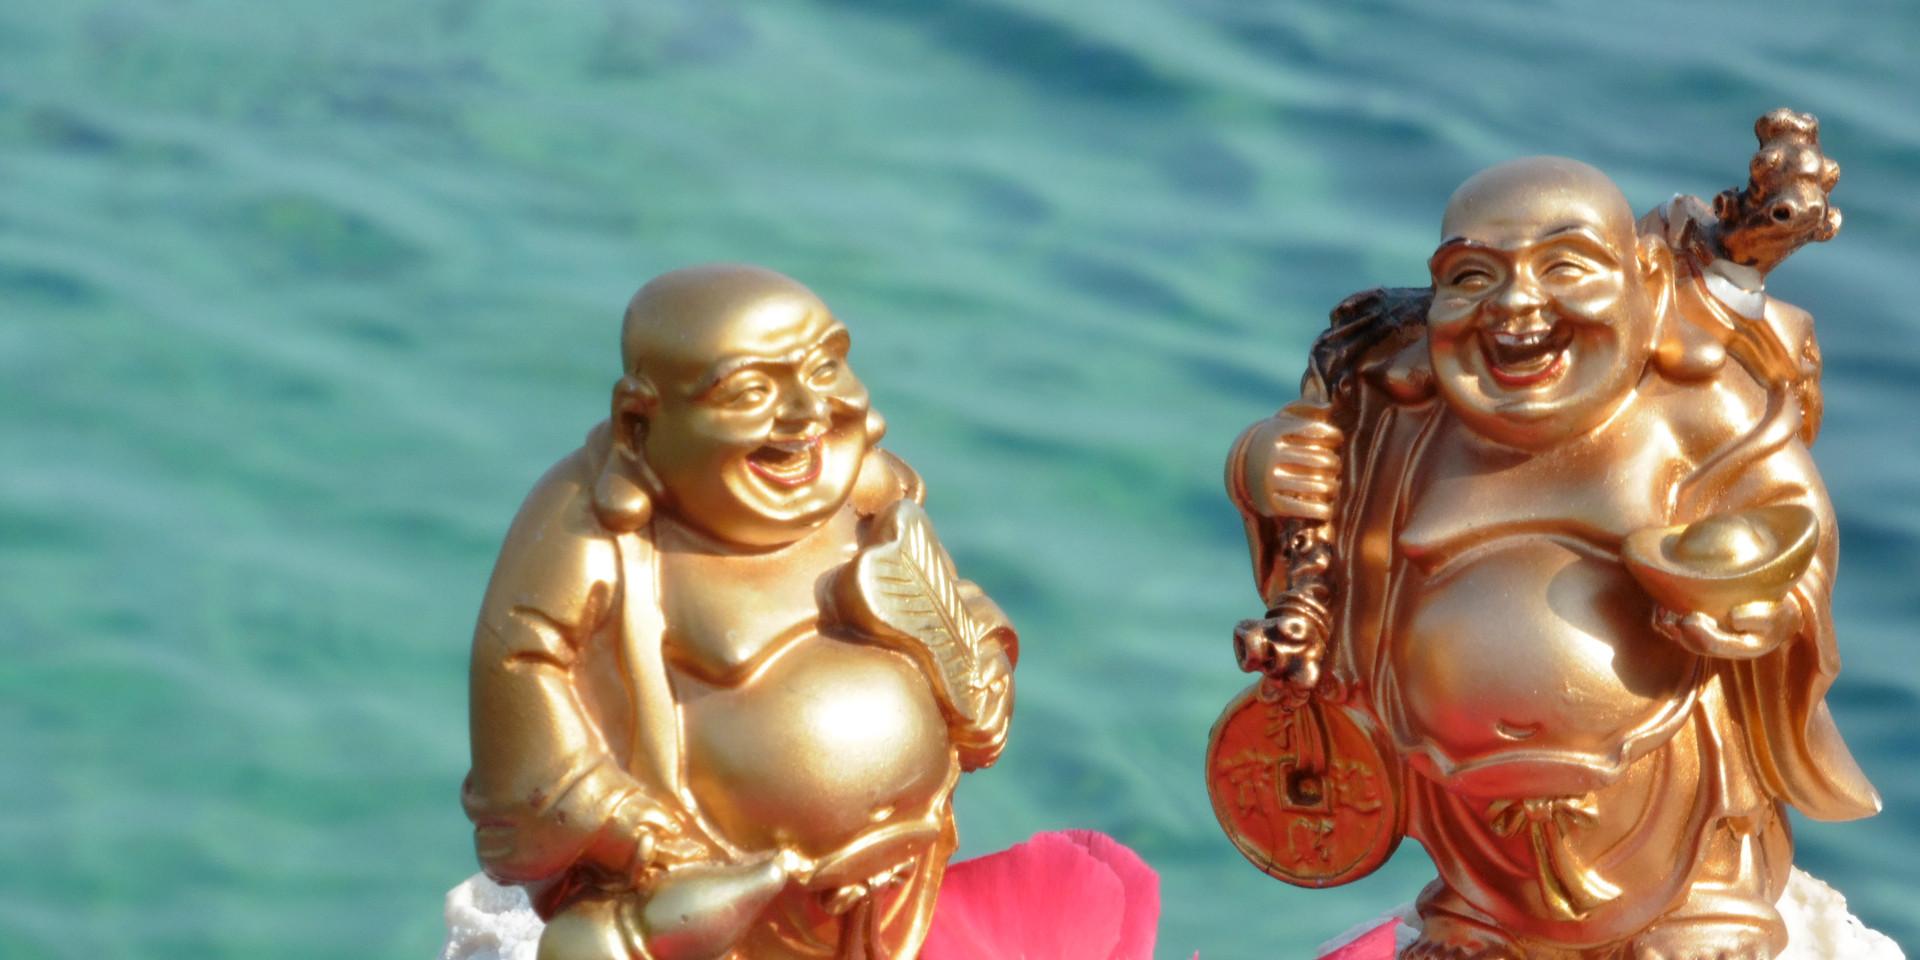 Laughing buddhas